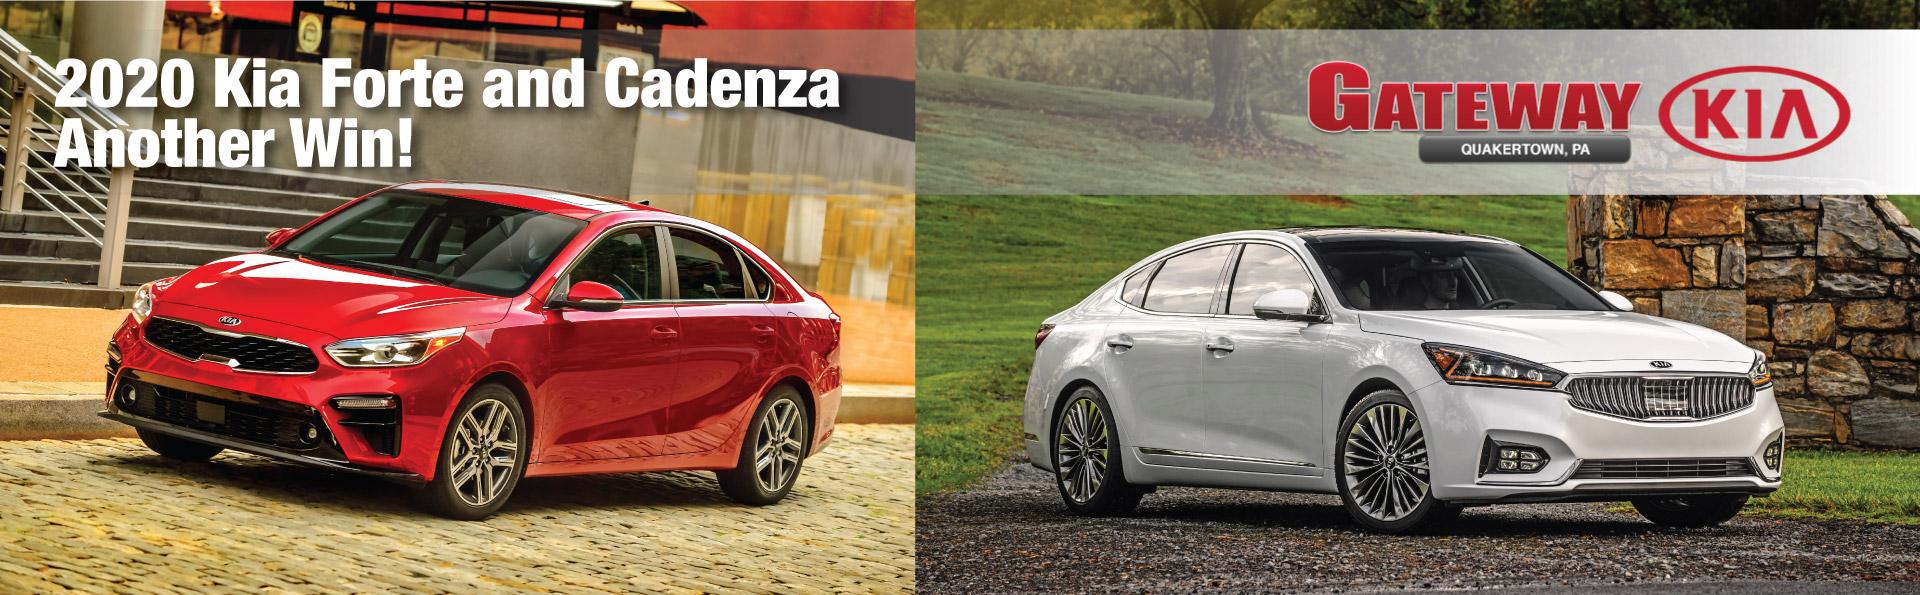 Kia Forte and Cadenza Win AutoPacific Vehicle Satisfaction Award